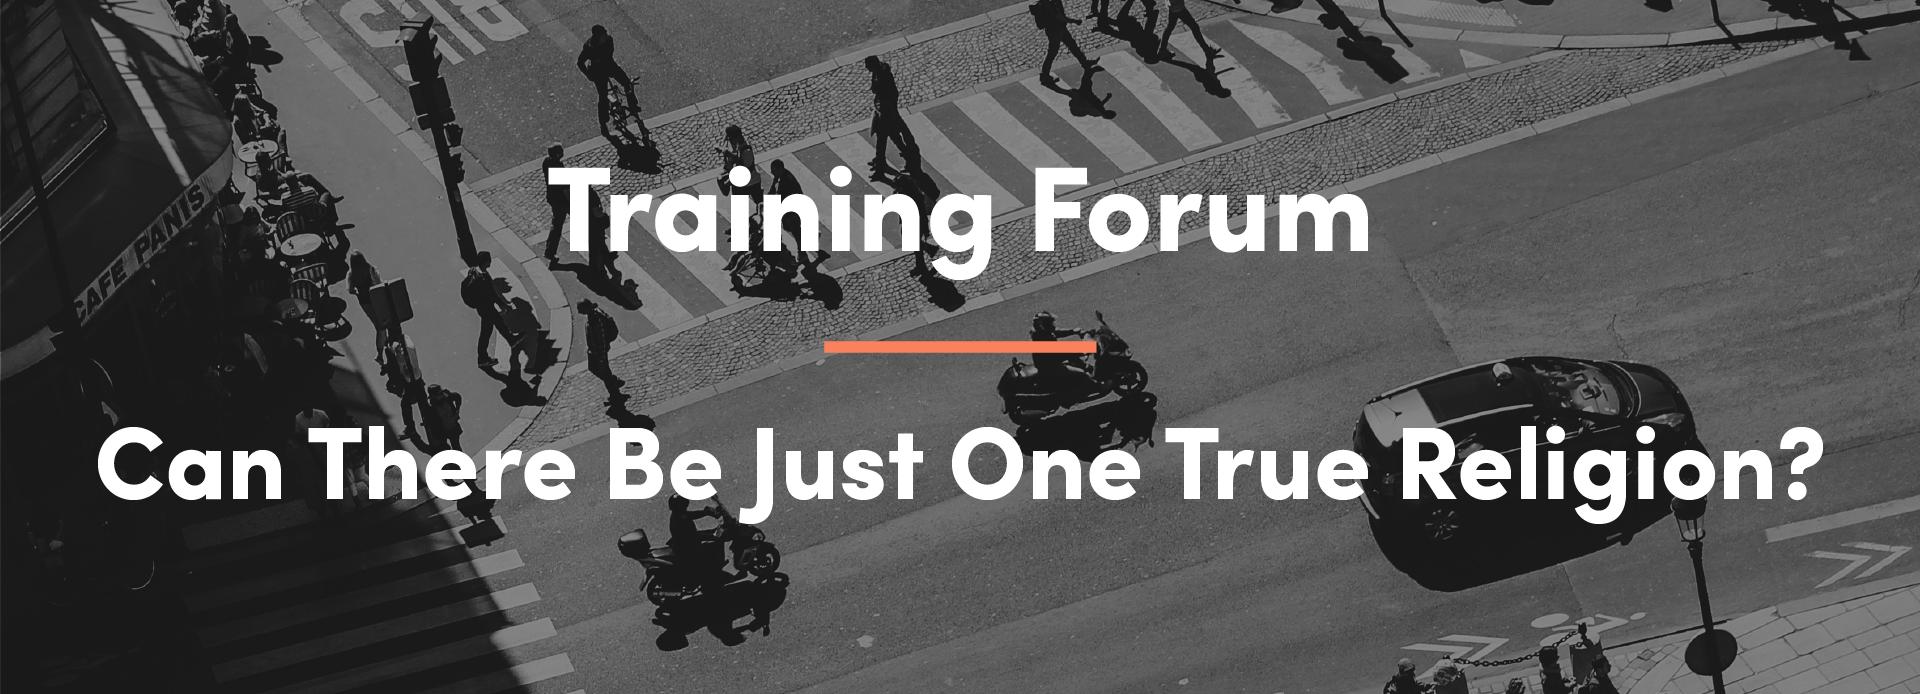 TrainingForum_Banner.png